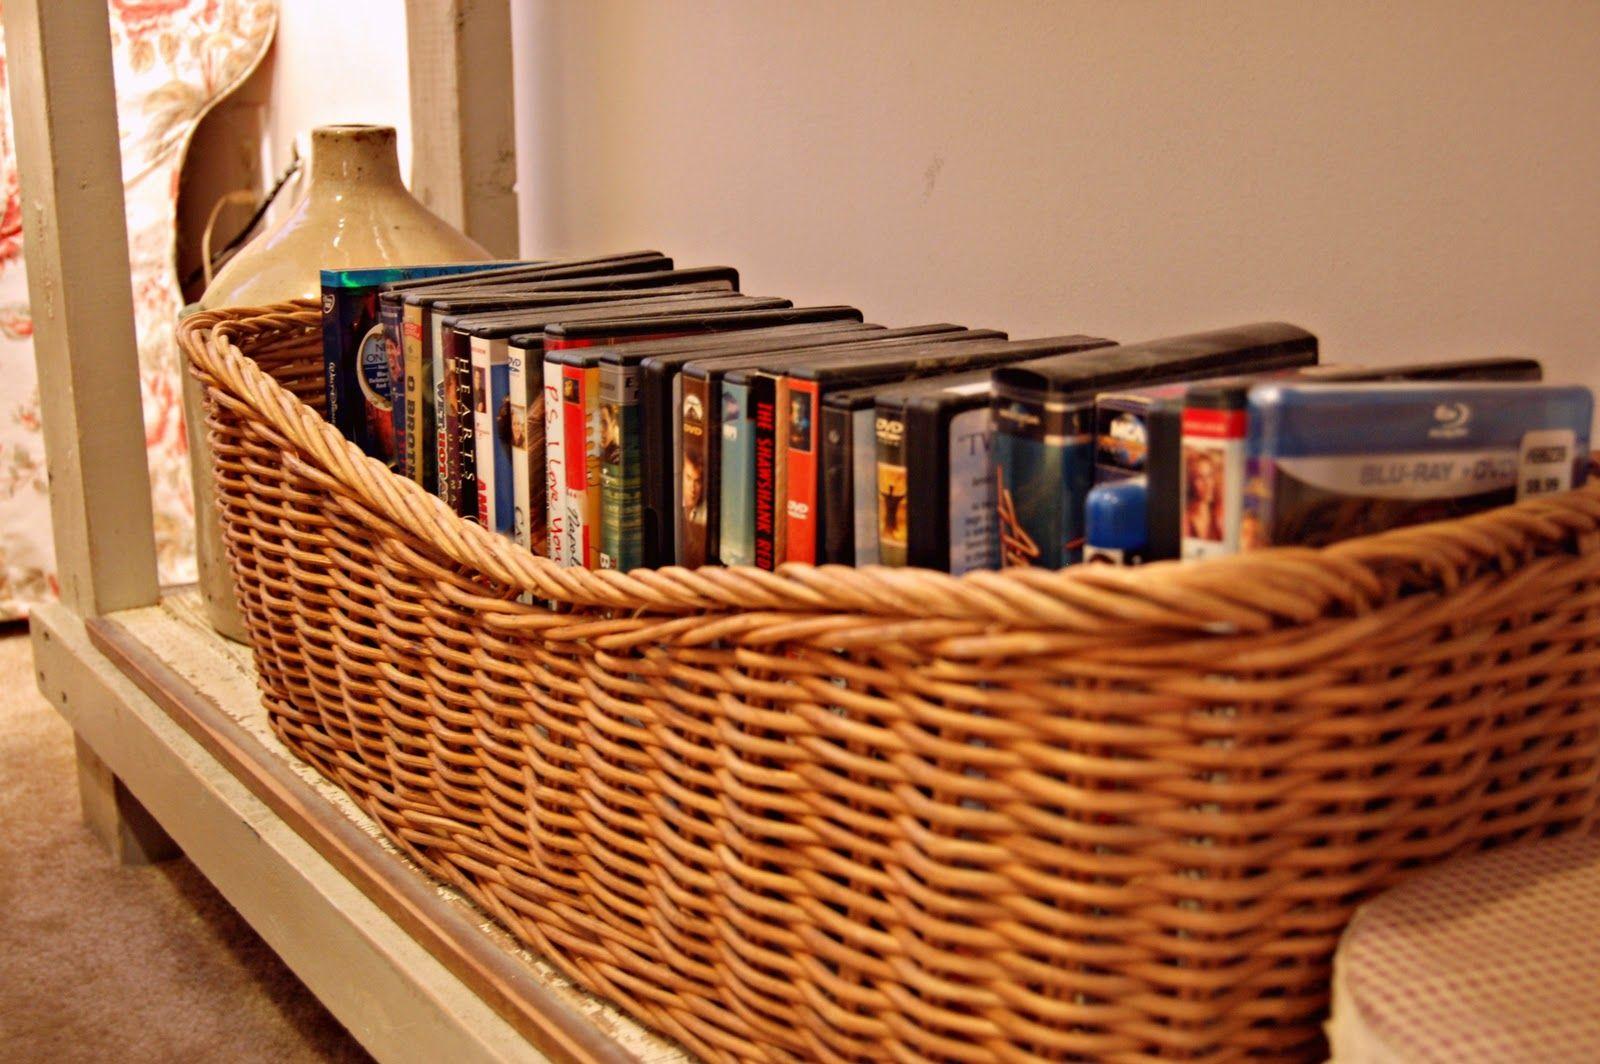 Amazing Long Wicker Basket Used For DVD Storage